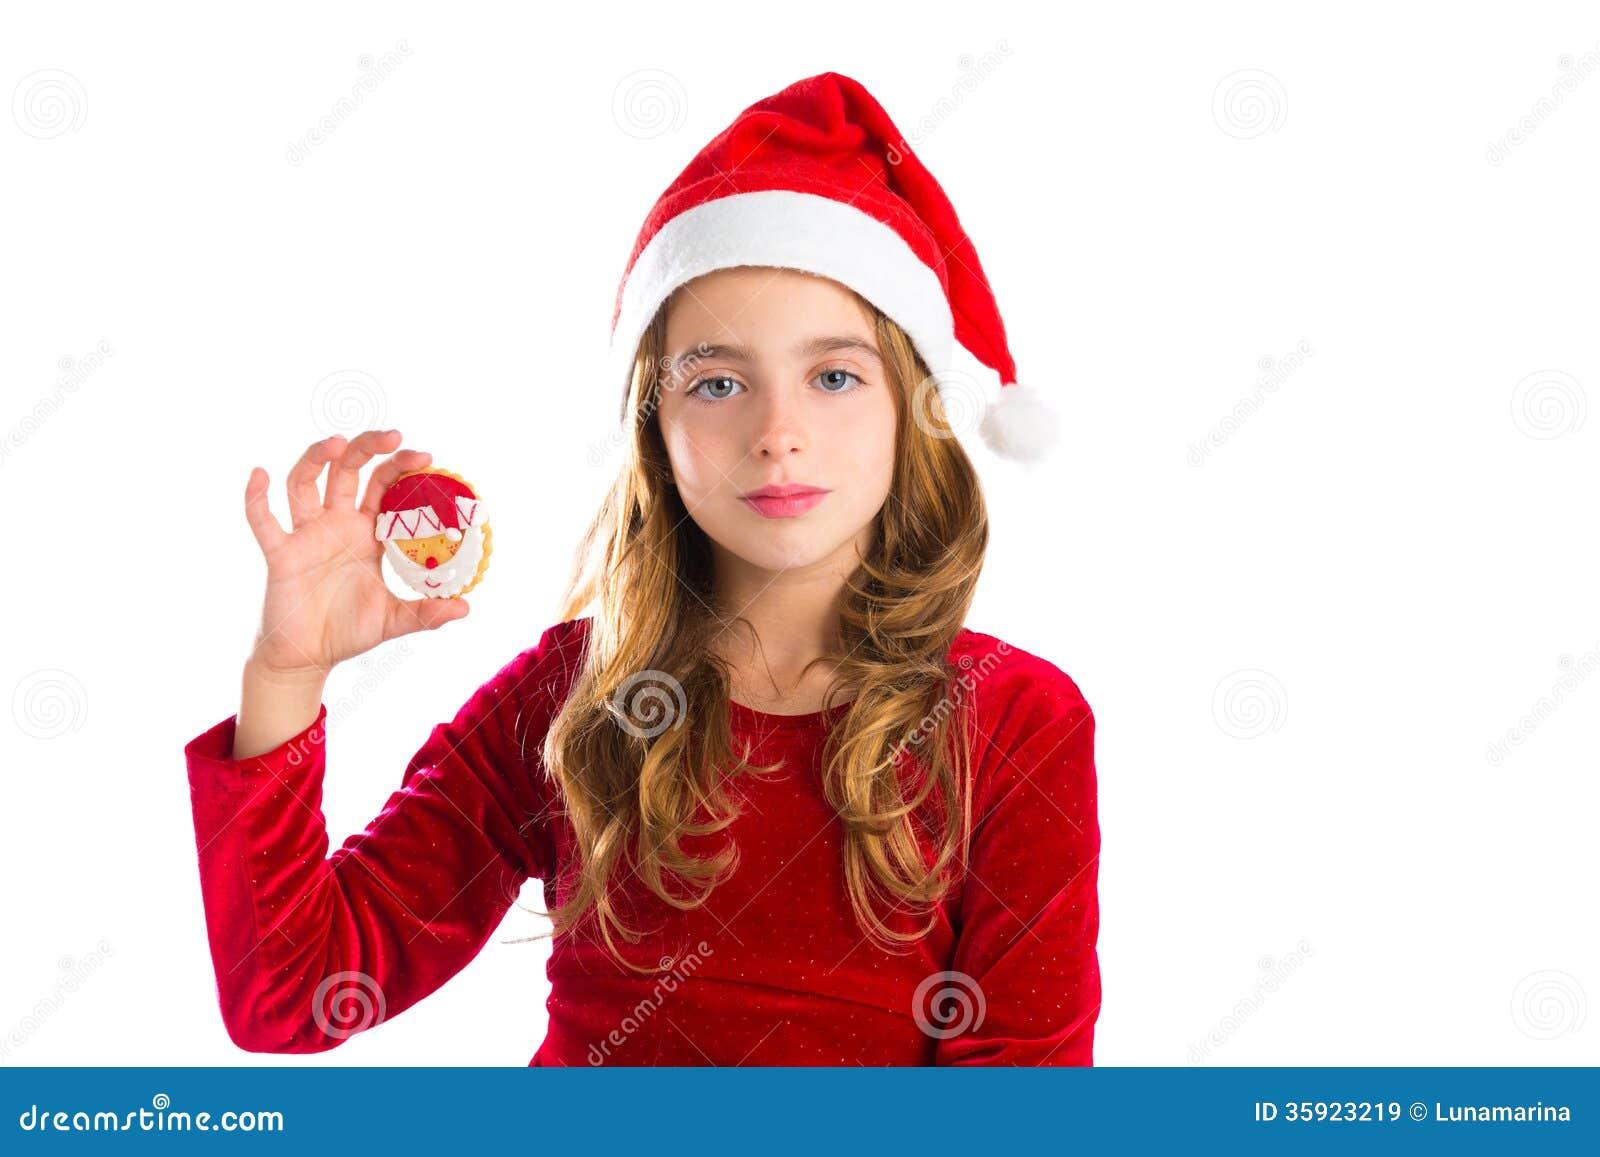 Christmas santa cookie and xmas dress kid girl royalty free stock